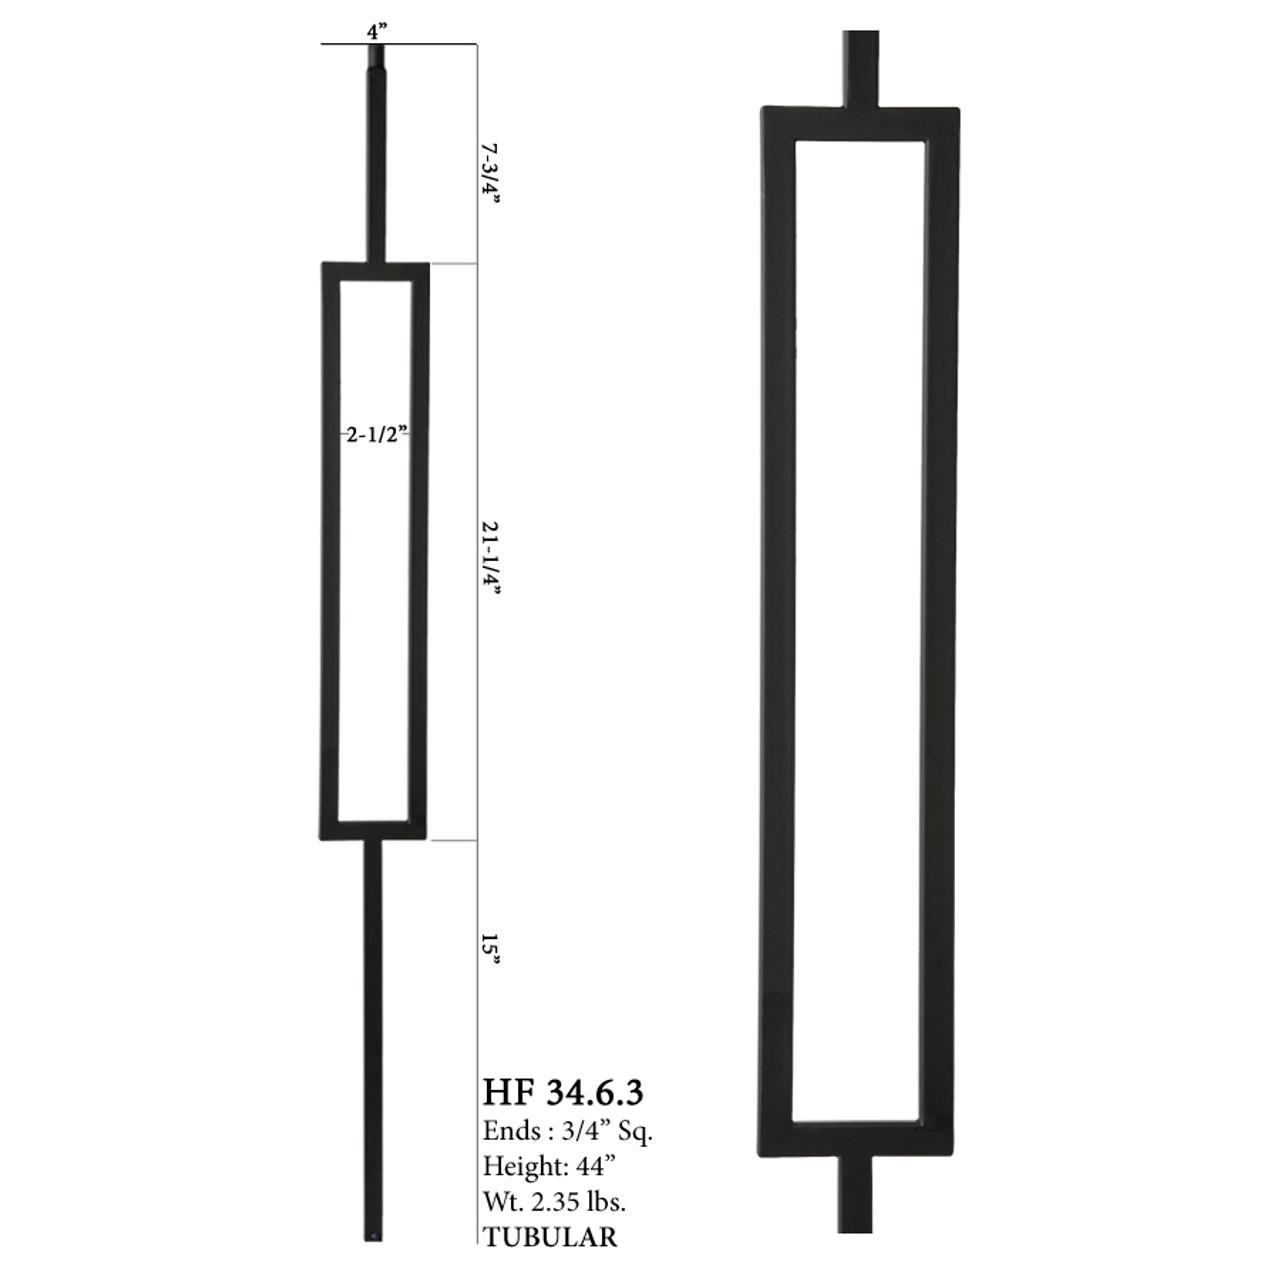 HF34.6.3 MEGA Single Rectangle Aalto Steel Baluster